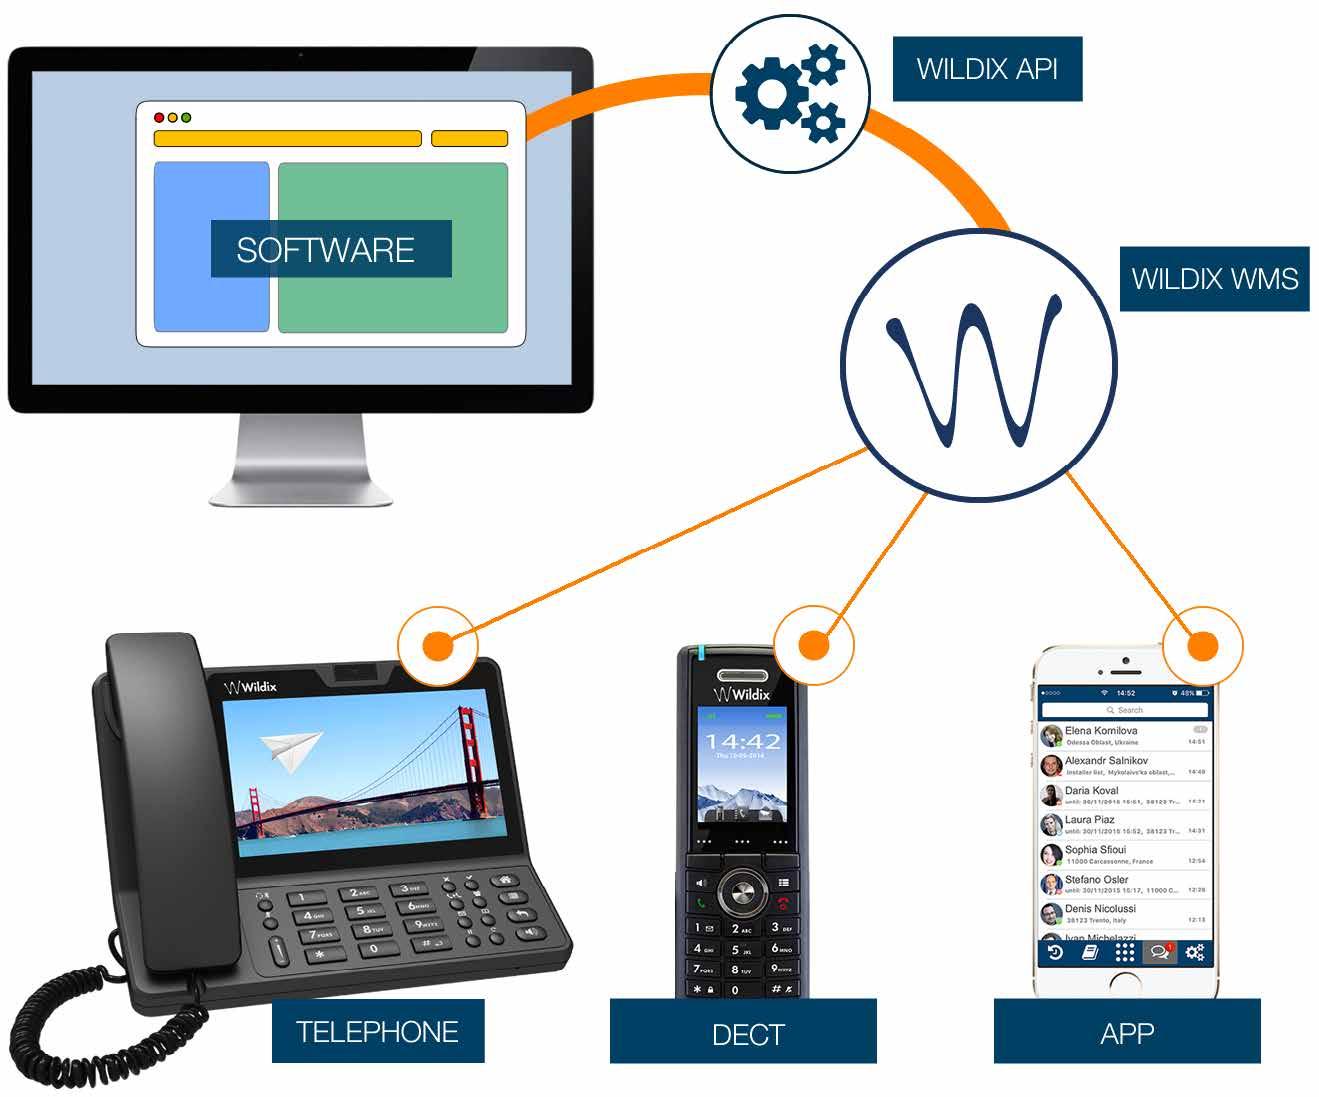 Wildix application programming interface